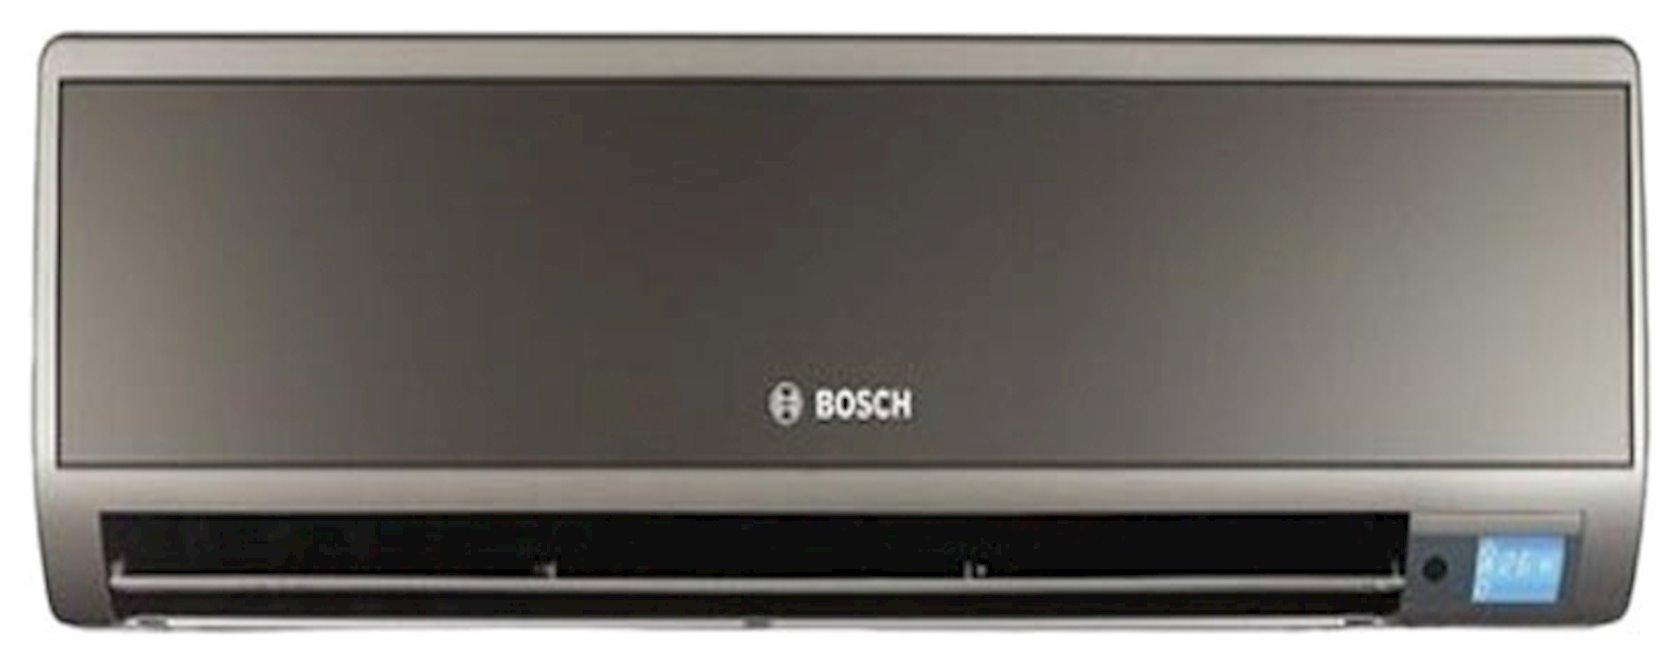 Kondisioner Bosch B1ZMA09507